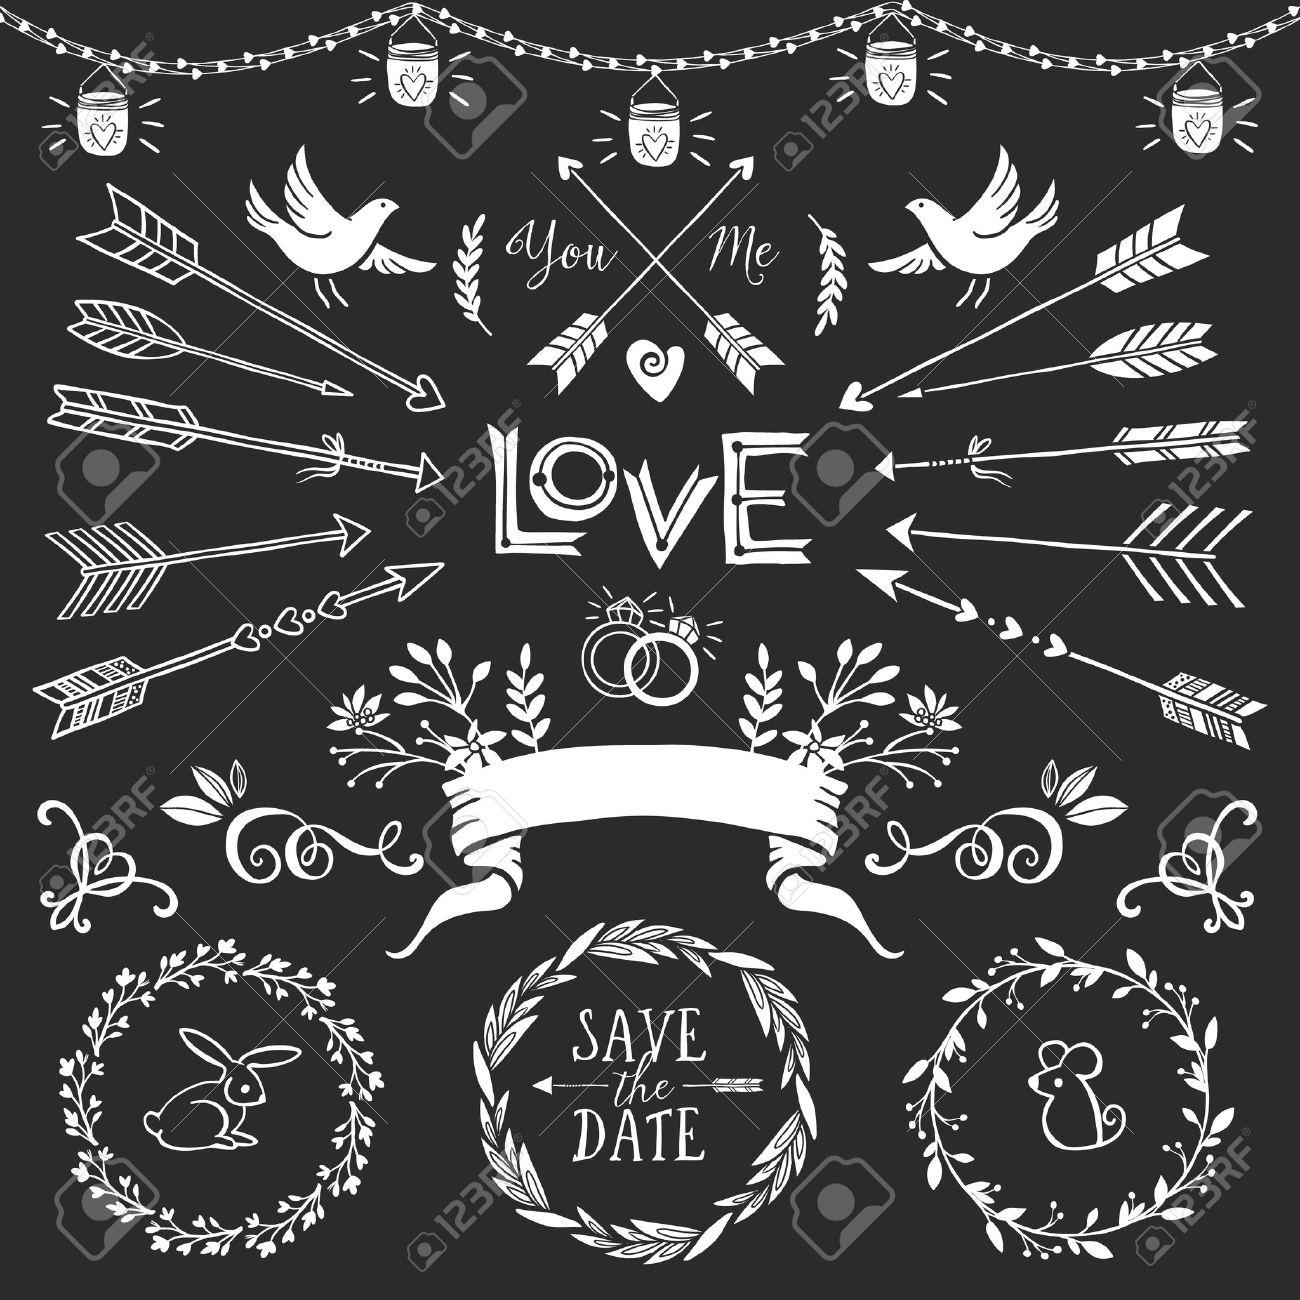 Vintage decorative elements with lettering hand drawn vector vintage decorative elements with lettering hand drawn vector design wedding set stock vector junglespirit Images